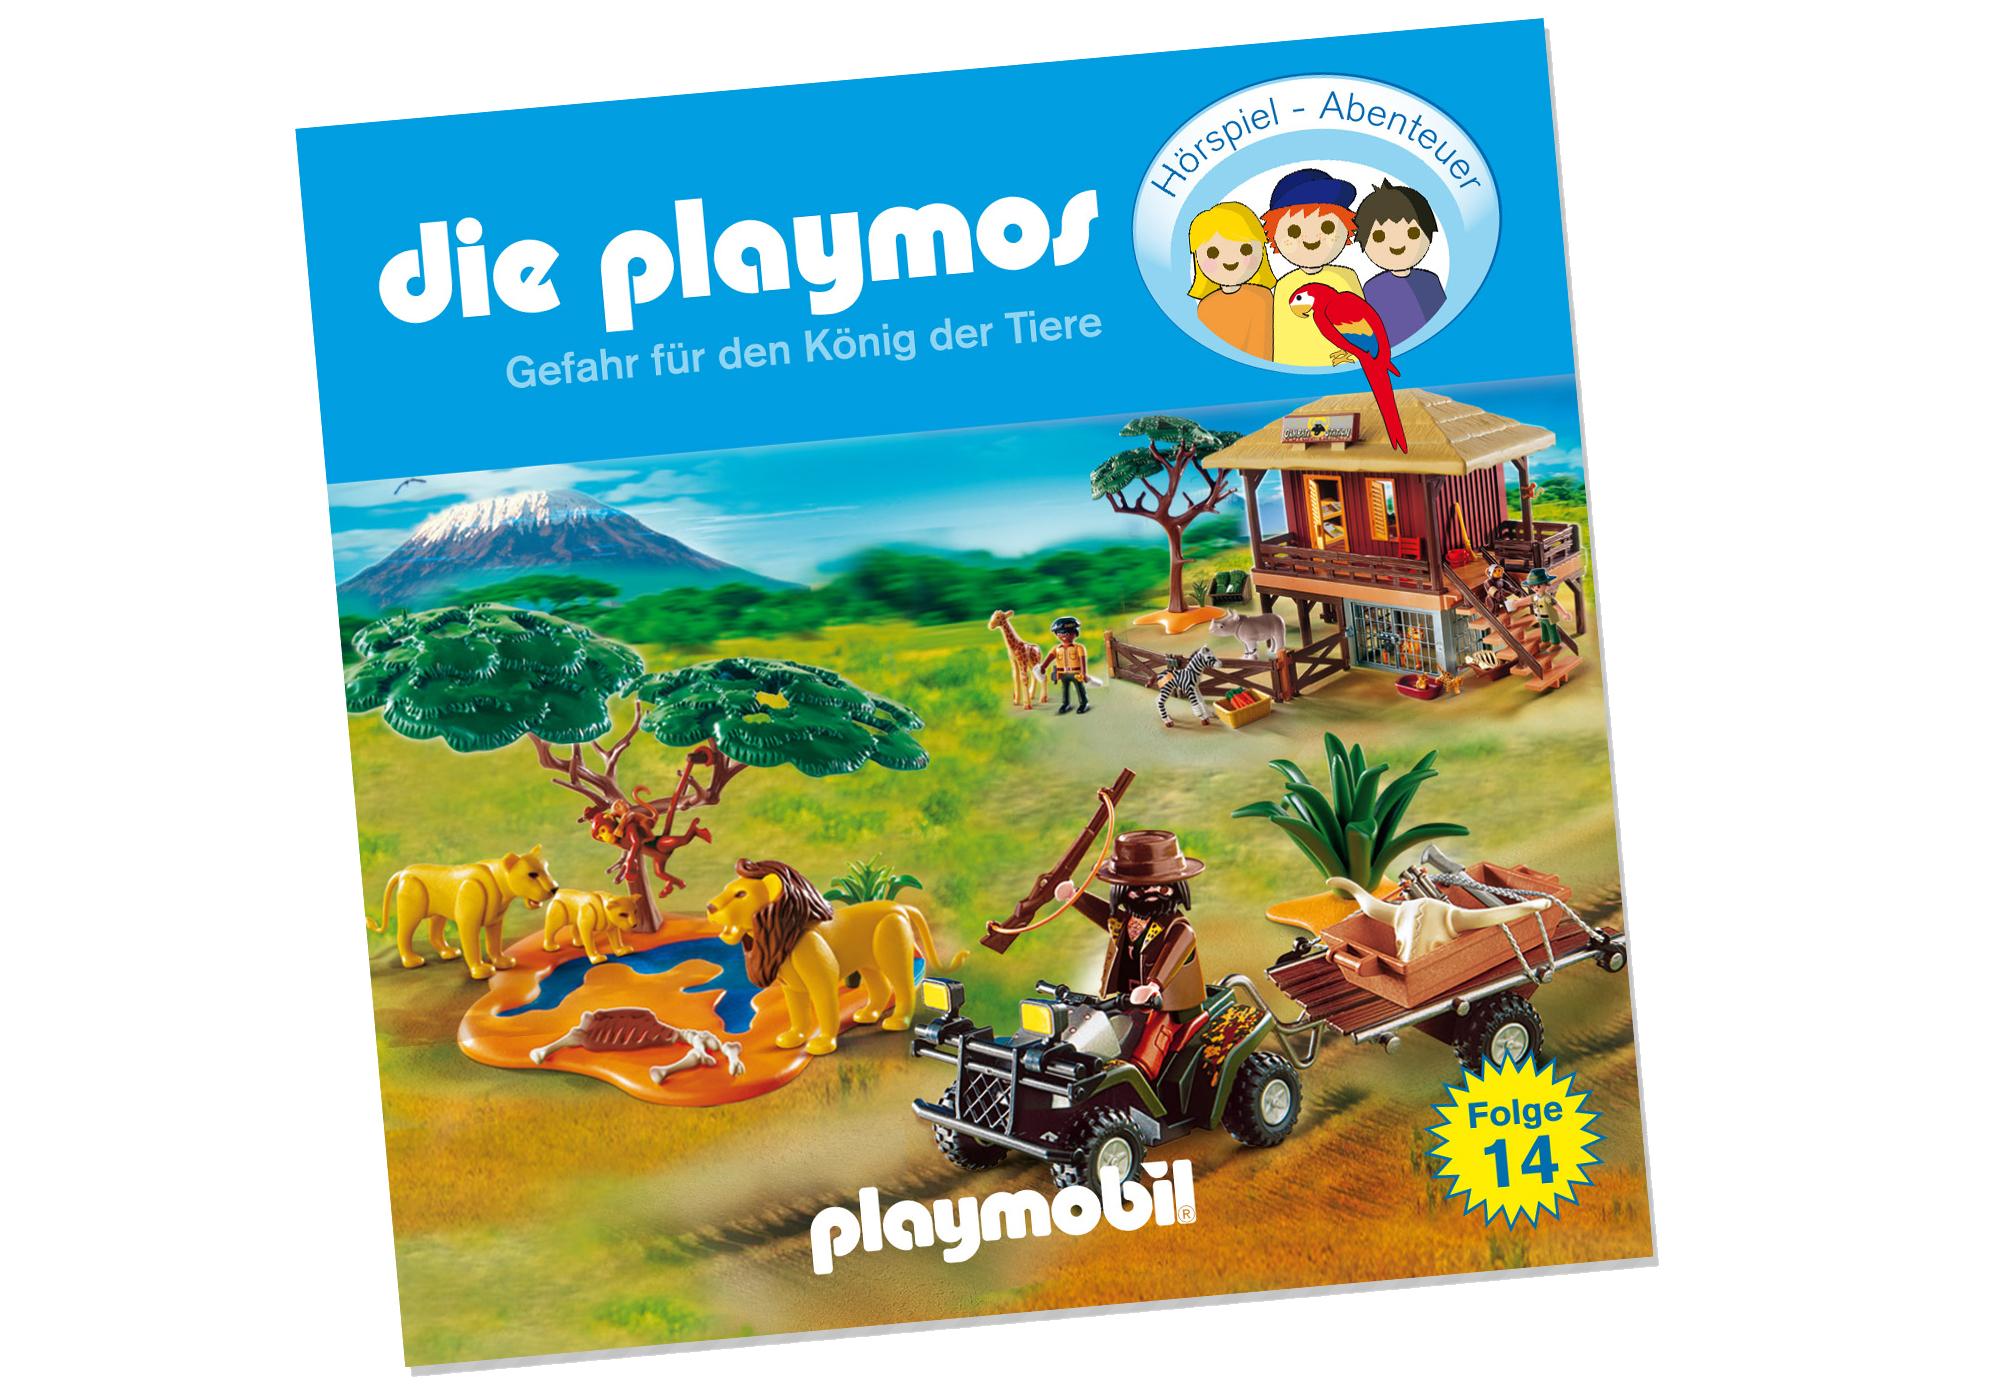 http://media.playmobil.com/i/playmobil/80245_product_detail/ Gefahr für den König der Tiere (14) - CD